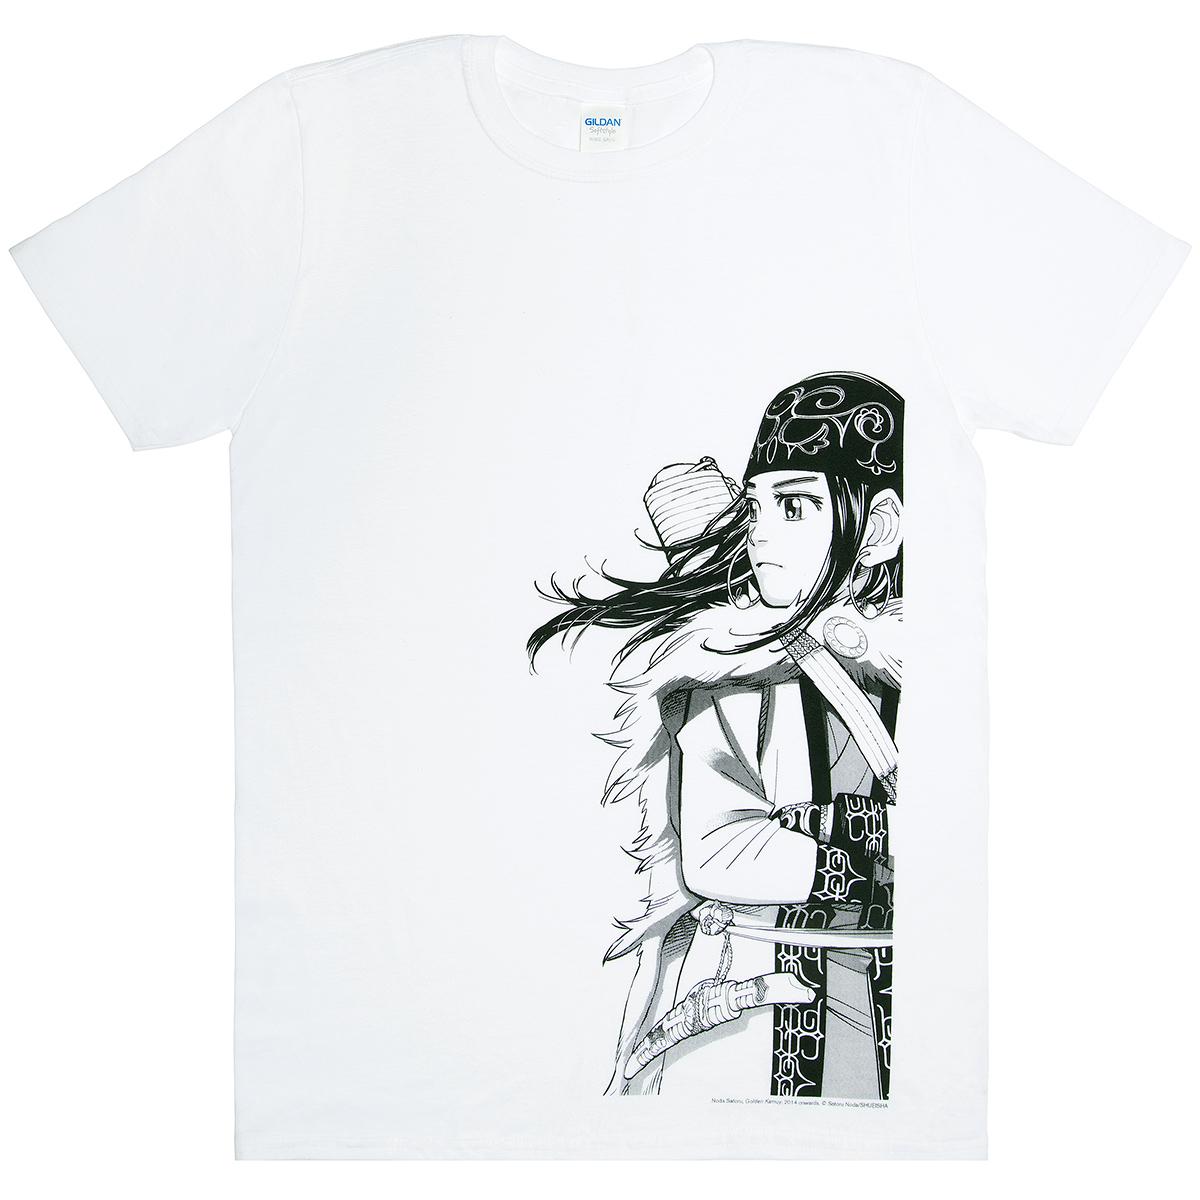 Golden Kamuy t-shirt (L)